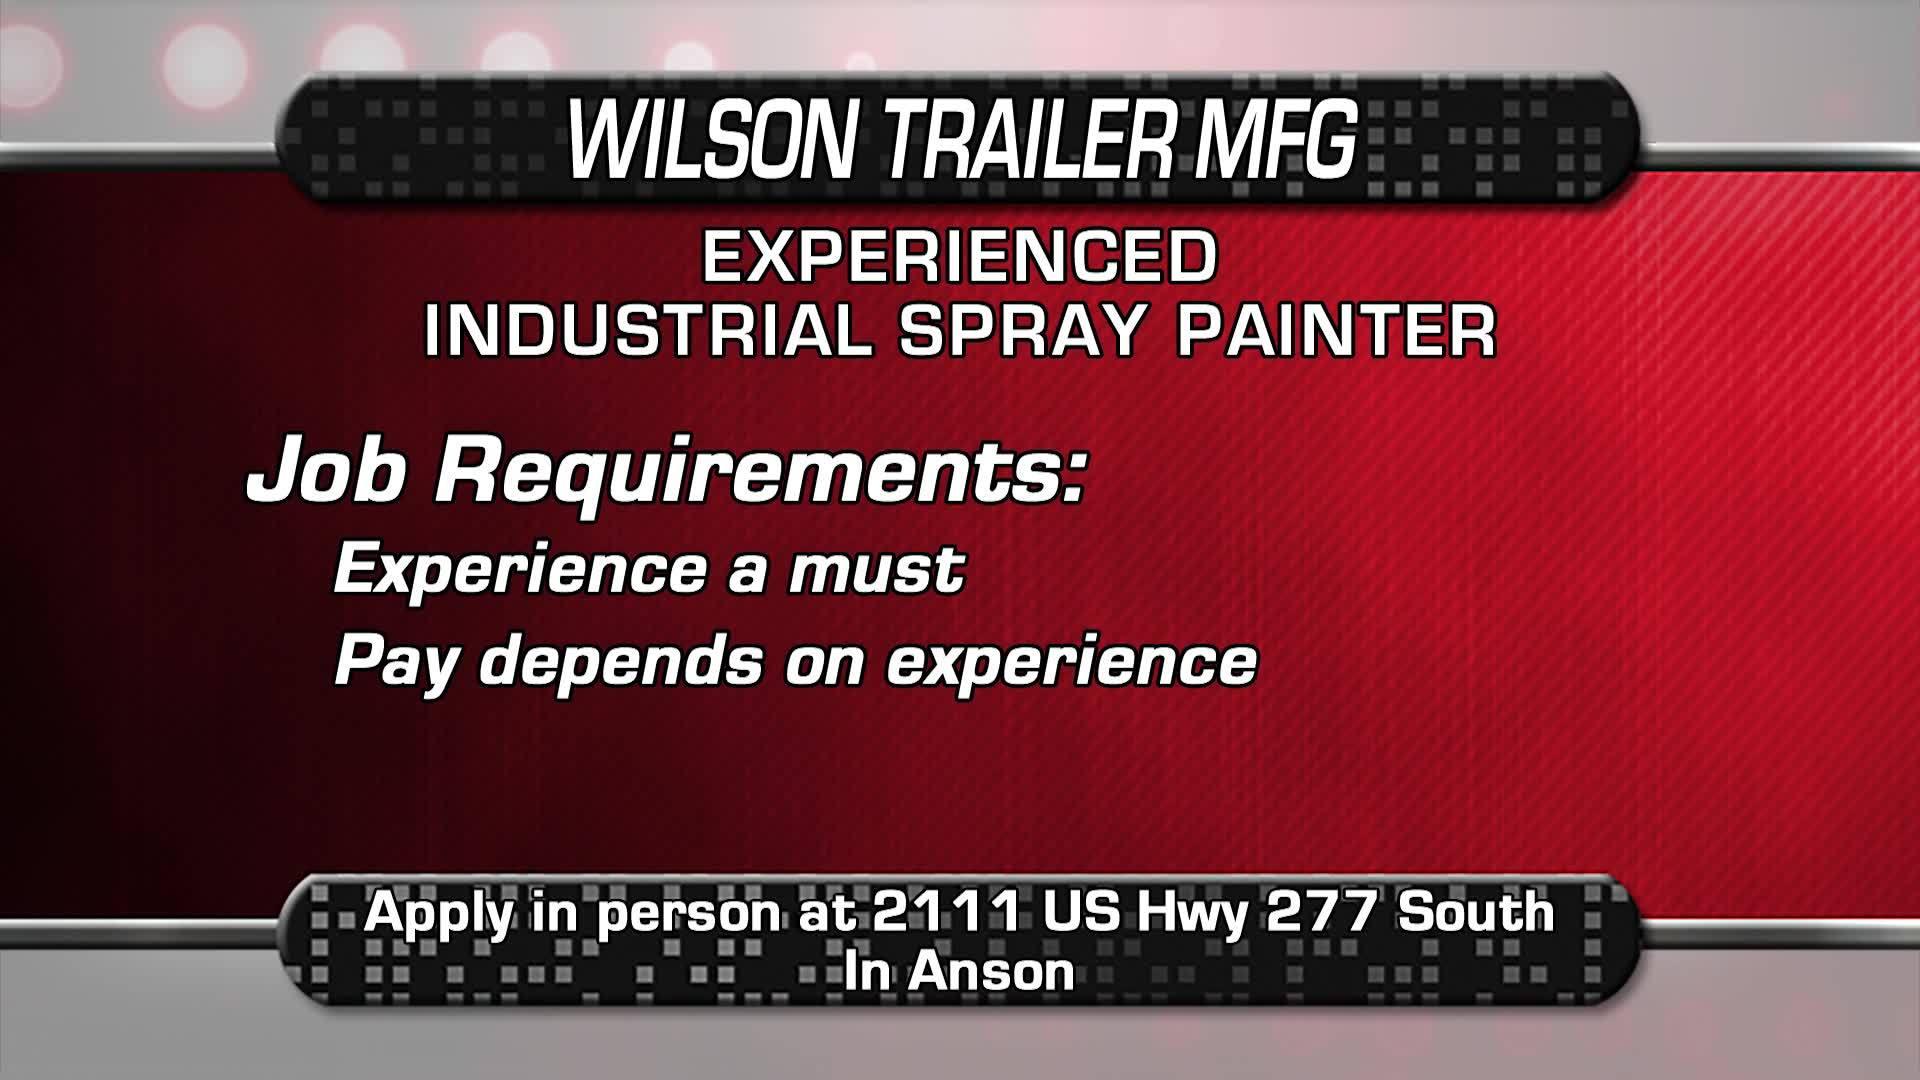 Industrial Spray Painter Needed